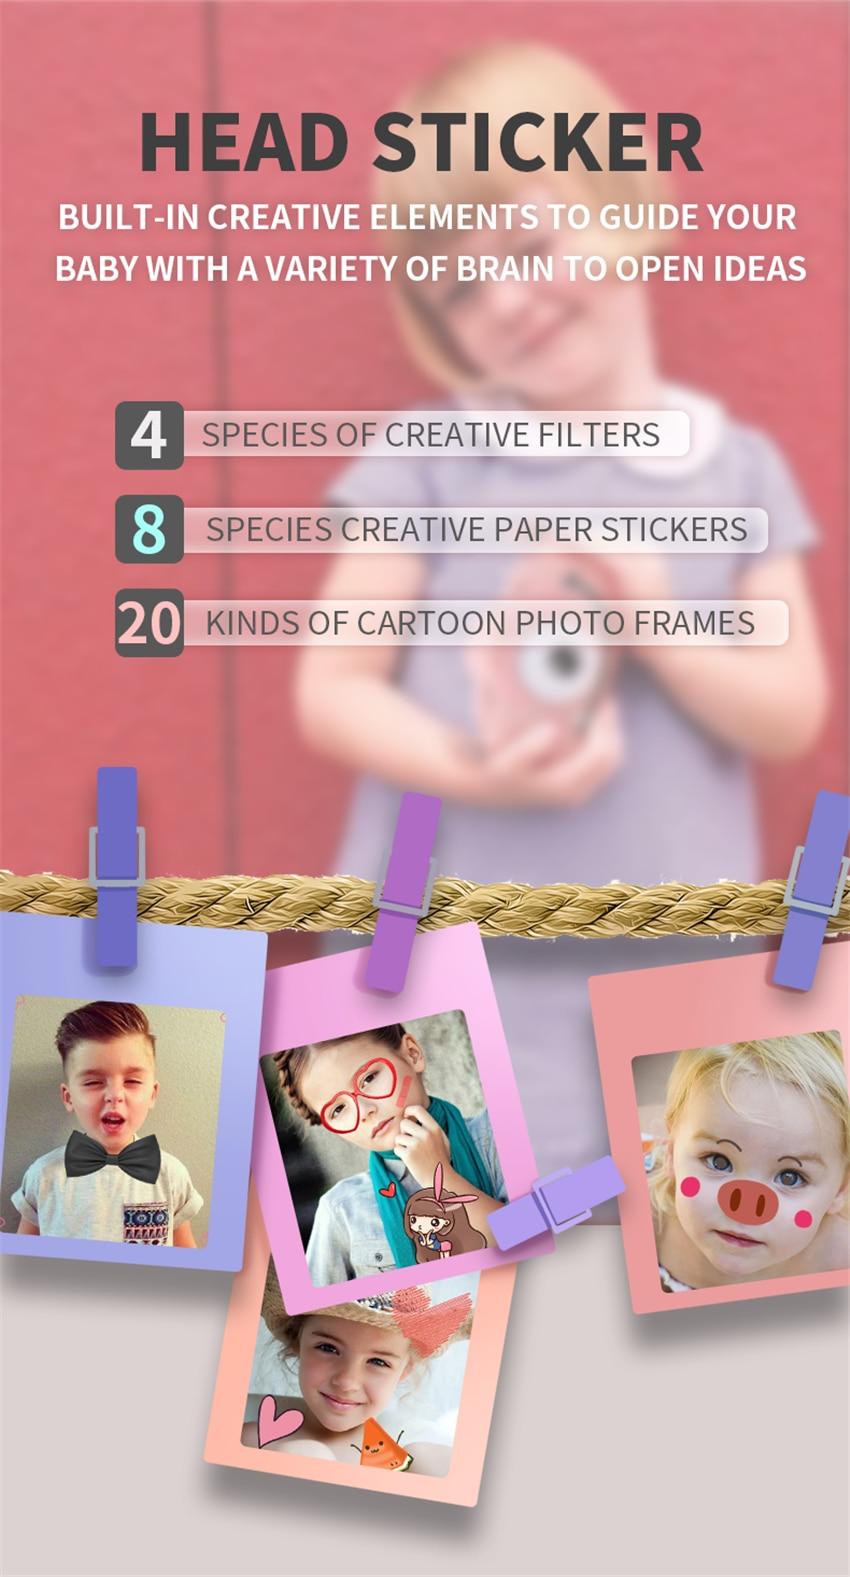 H5d432c9fb9684669a75bbc57beef9455B x8 2.0 inch Screen Kids Camera Mini Digital 12MP Photo Children Camera with 600 mAh Polymer Lithium Battery Toys Gift